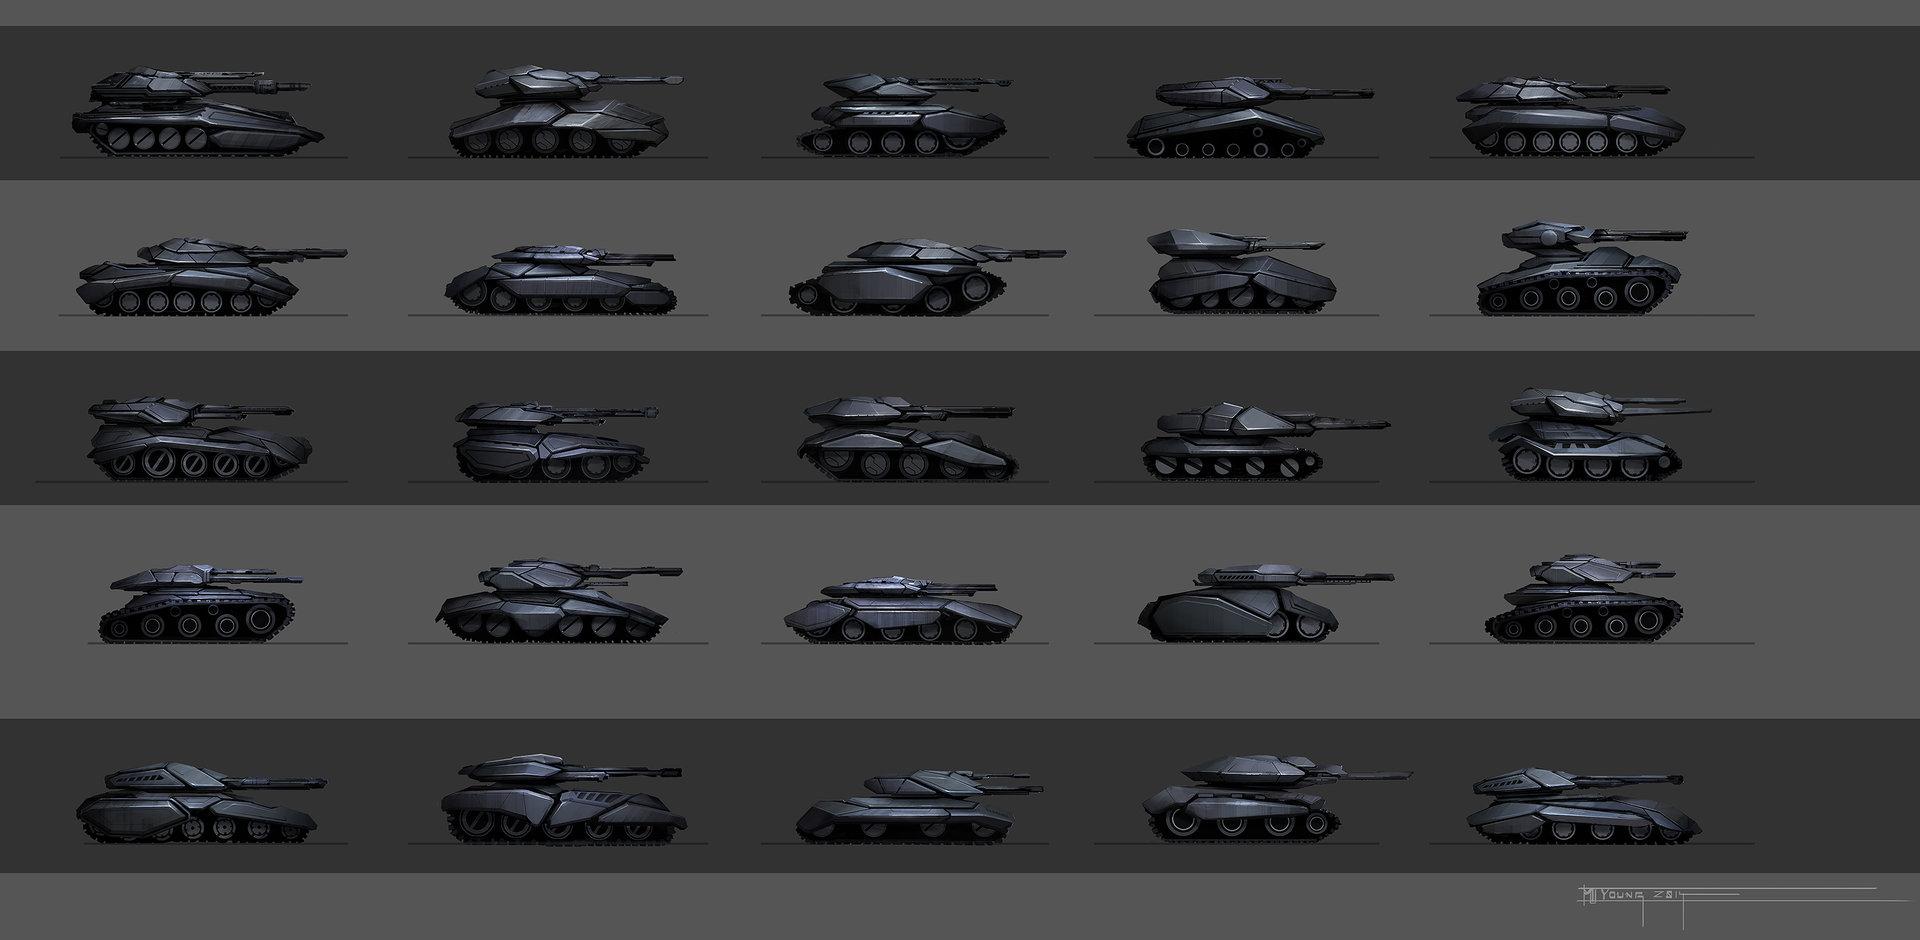 Muyoung kim armor asia corp tank concept thumbnails